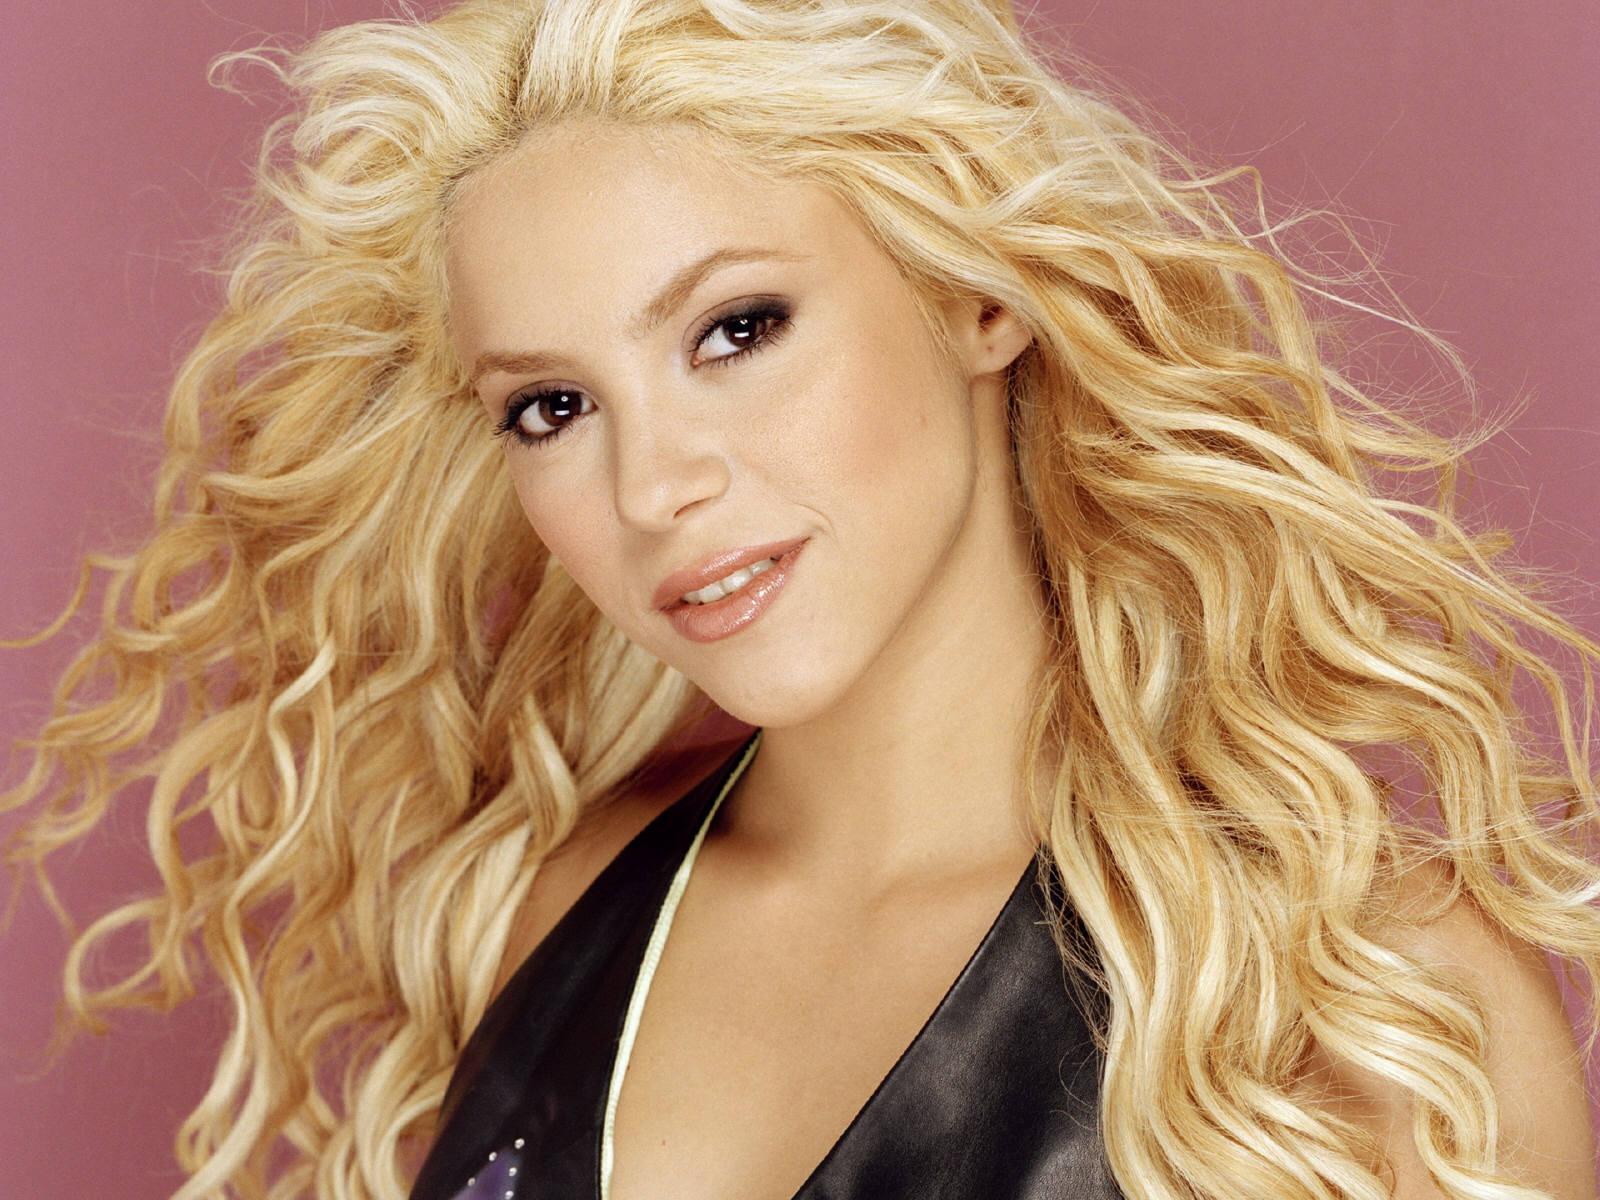 Cute Baby Full Hd Wallpaper Download Shakira Wallpaper Shakira Wallpaper Hd Simple Wallpapers